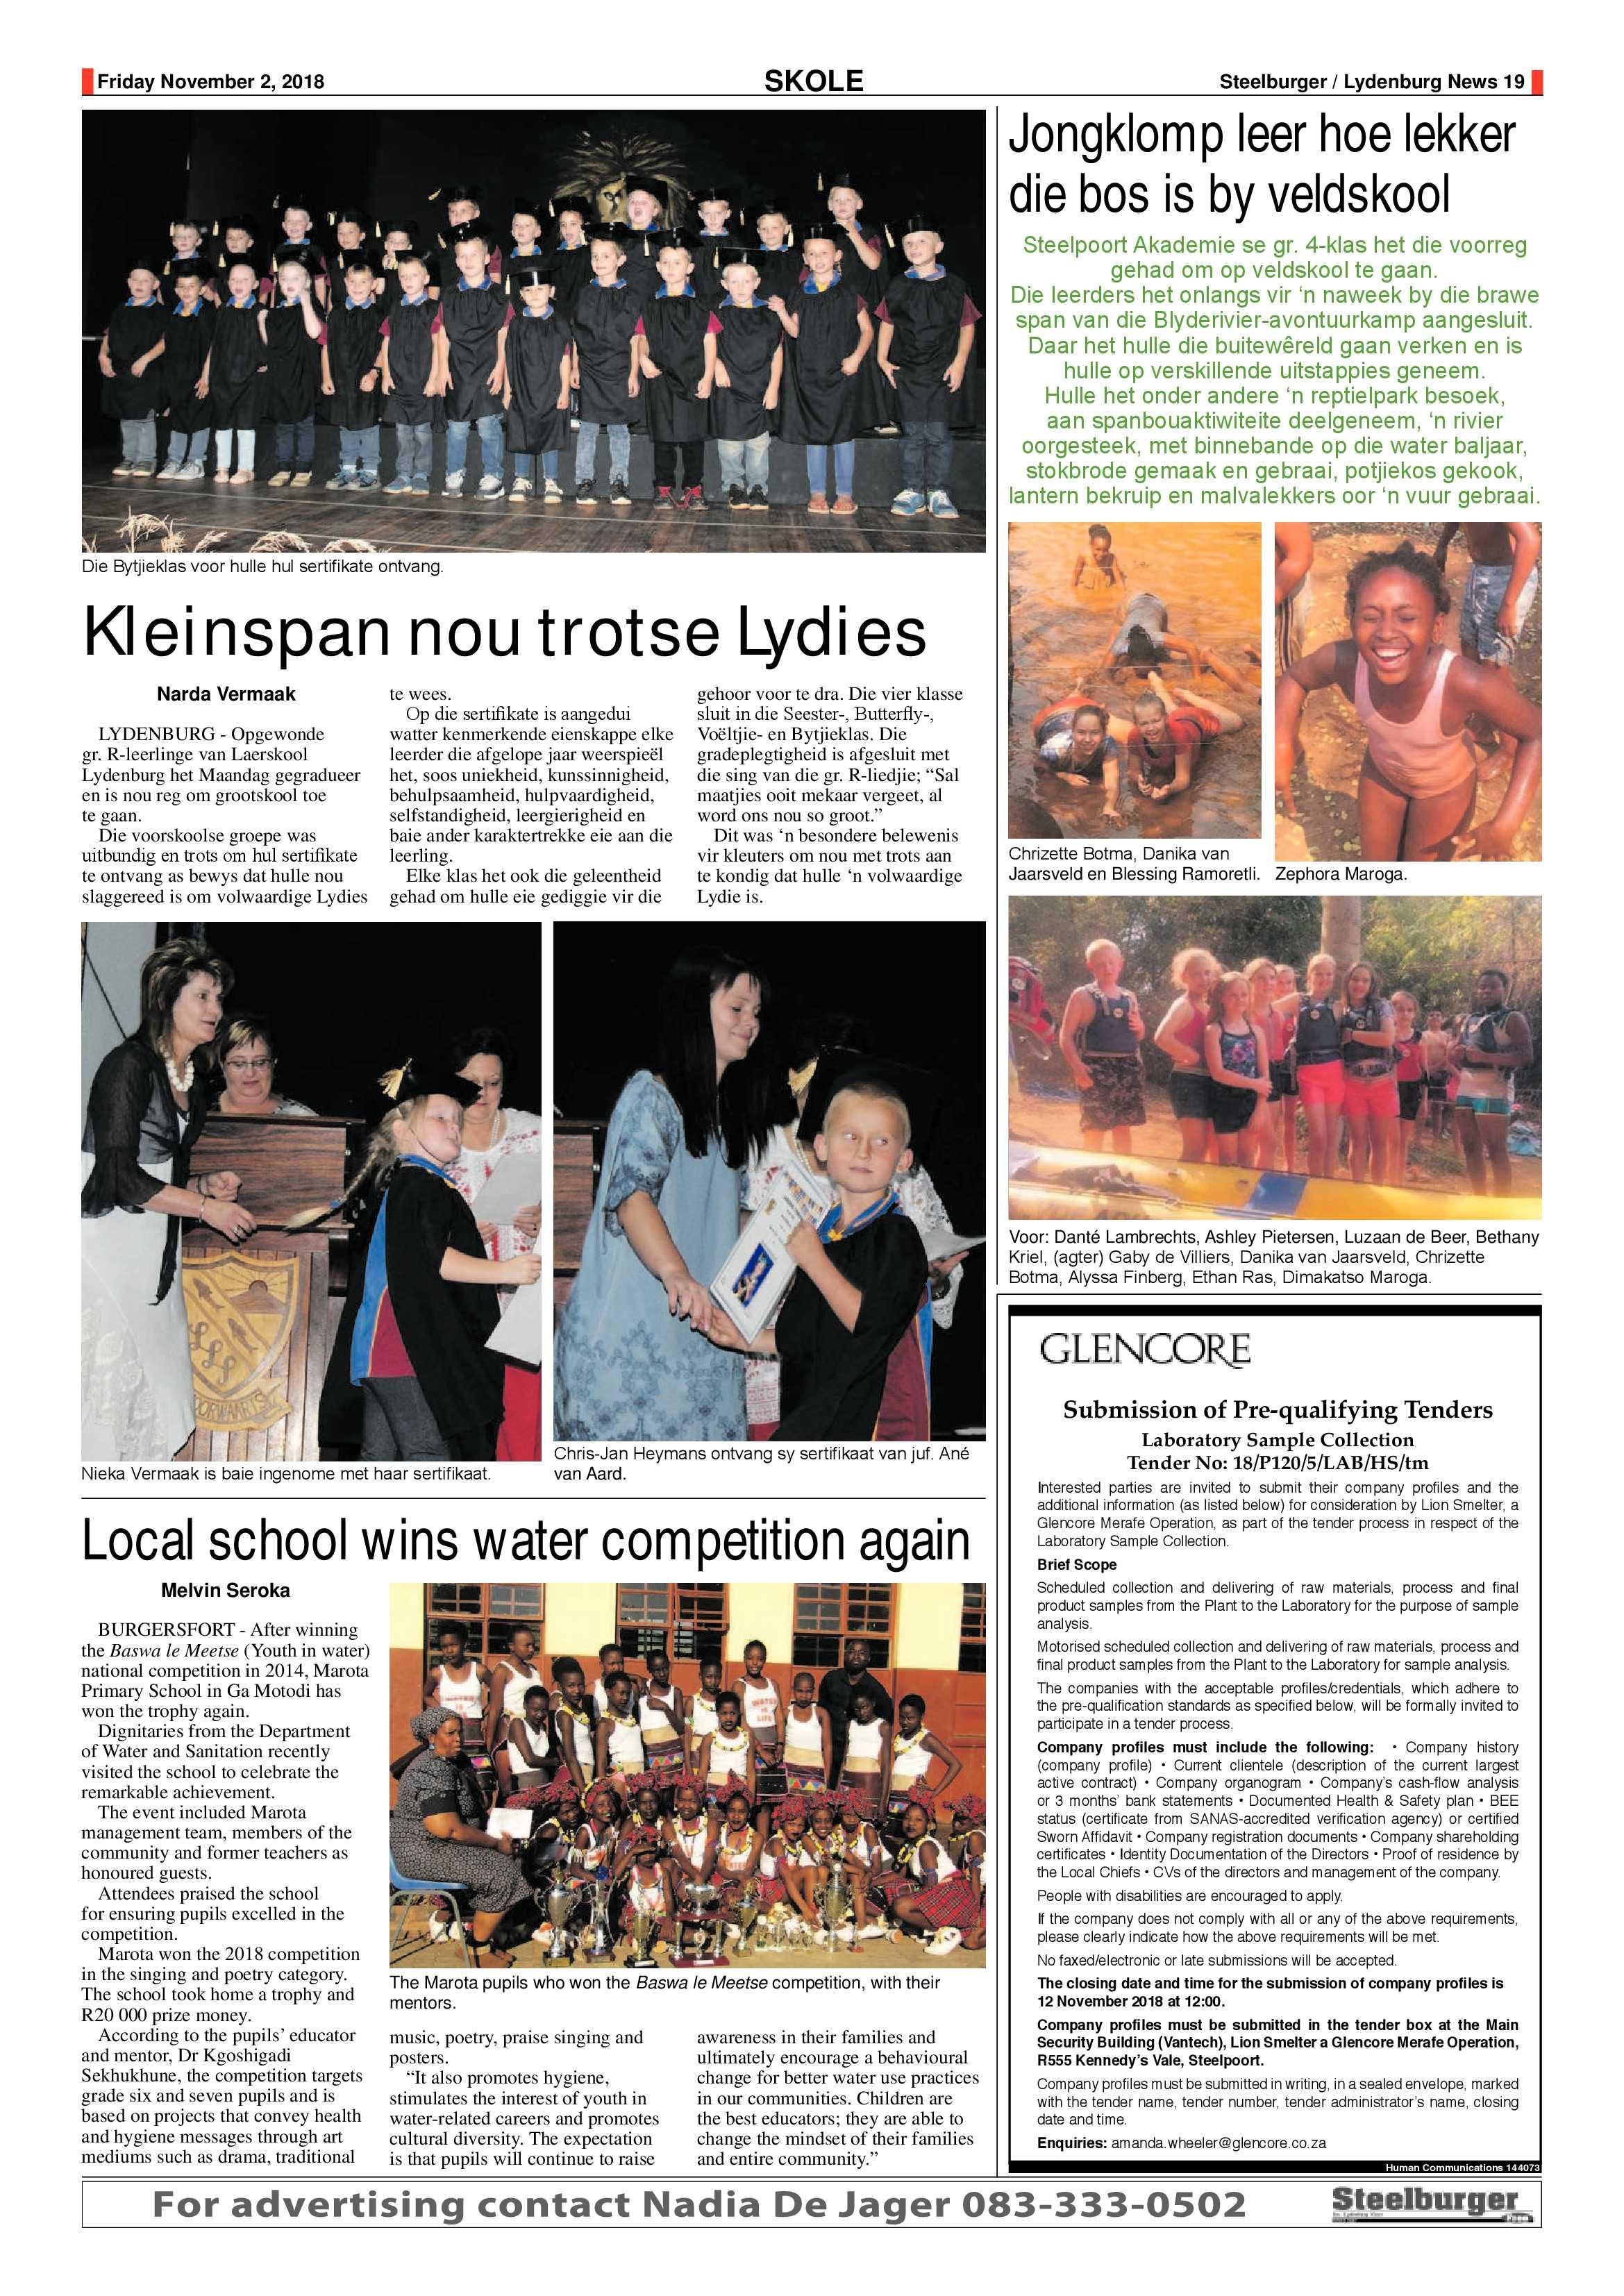 steelburger-news-2-november-2018-epapers-page-19